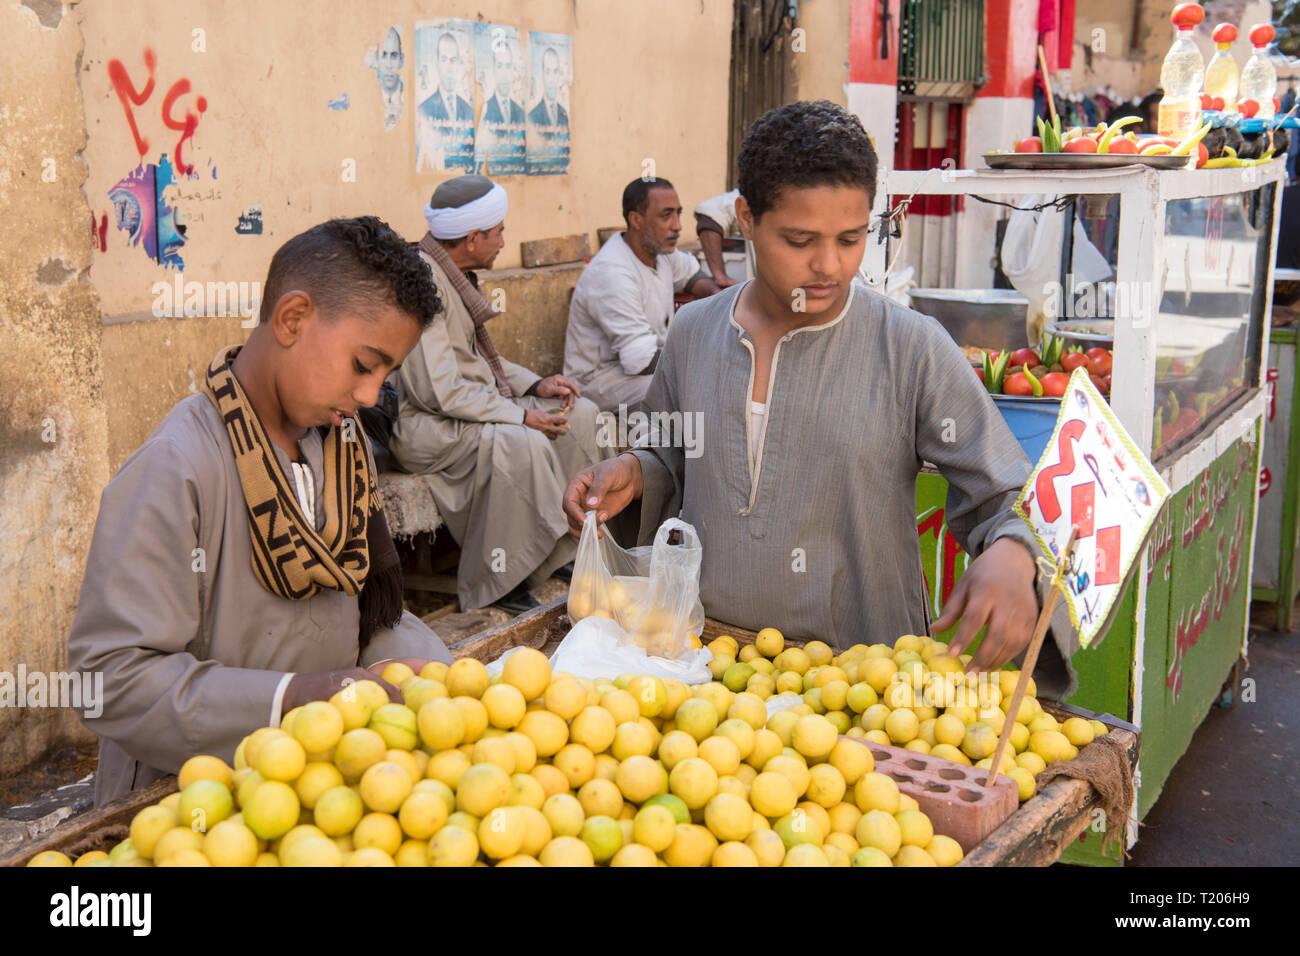 Ägypten, Luxor, im Souk Stock Photo